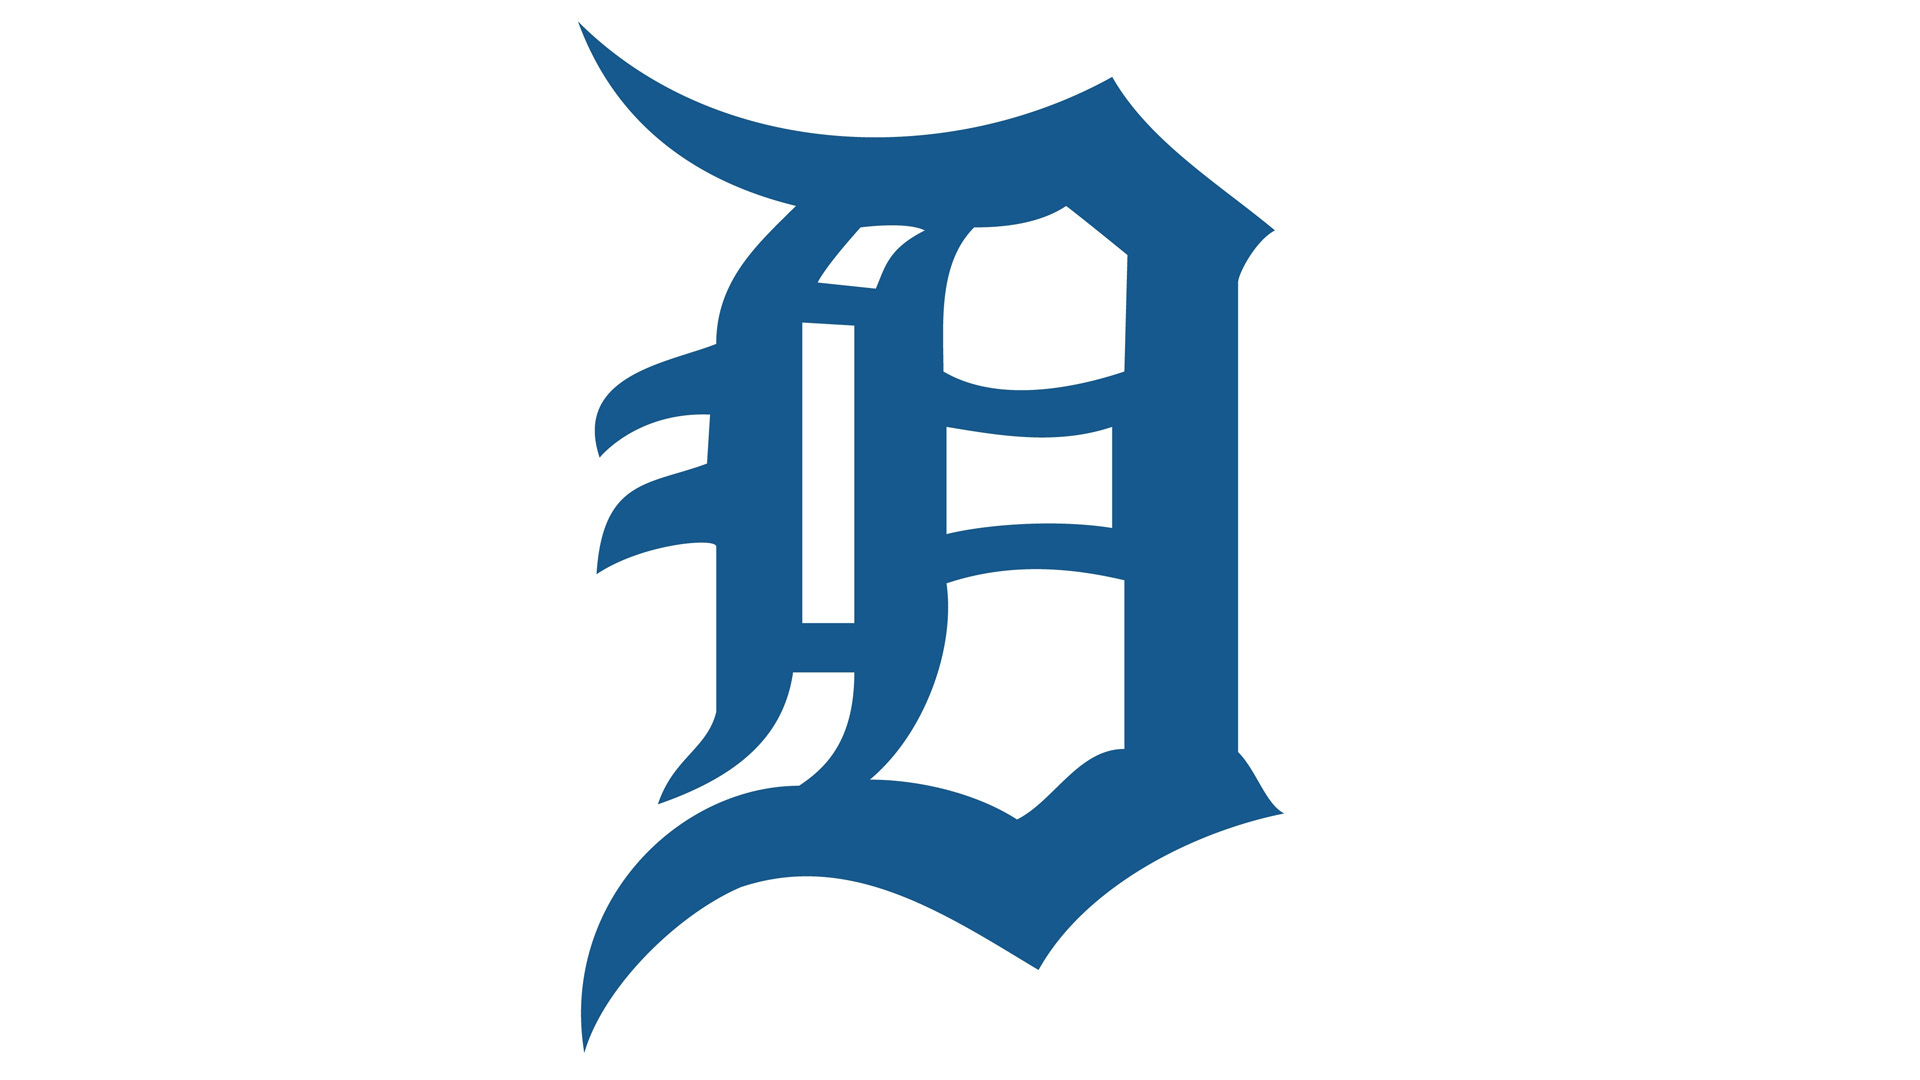 Detroit Tigers Pictures